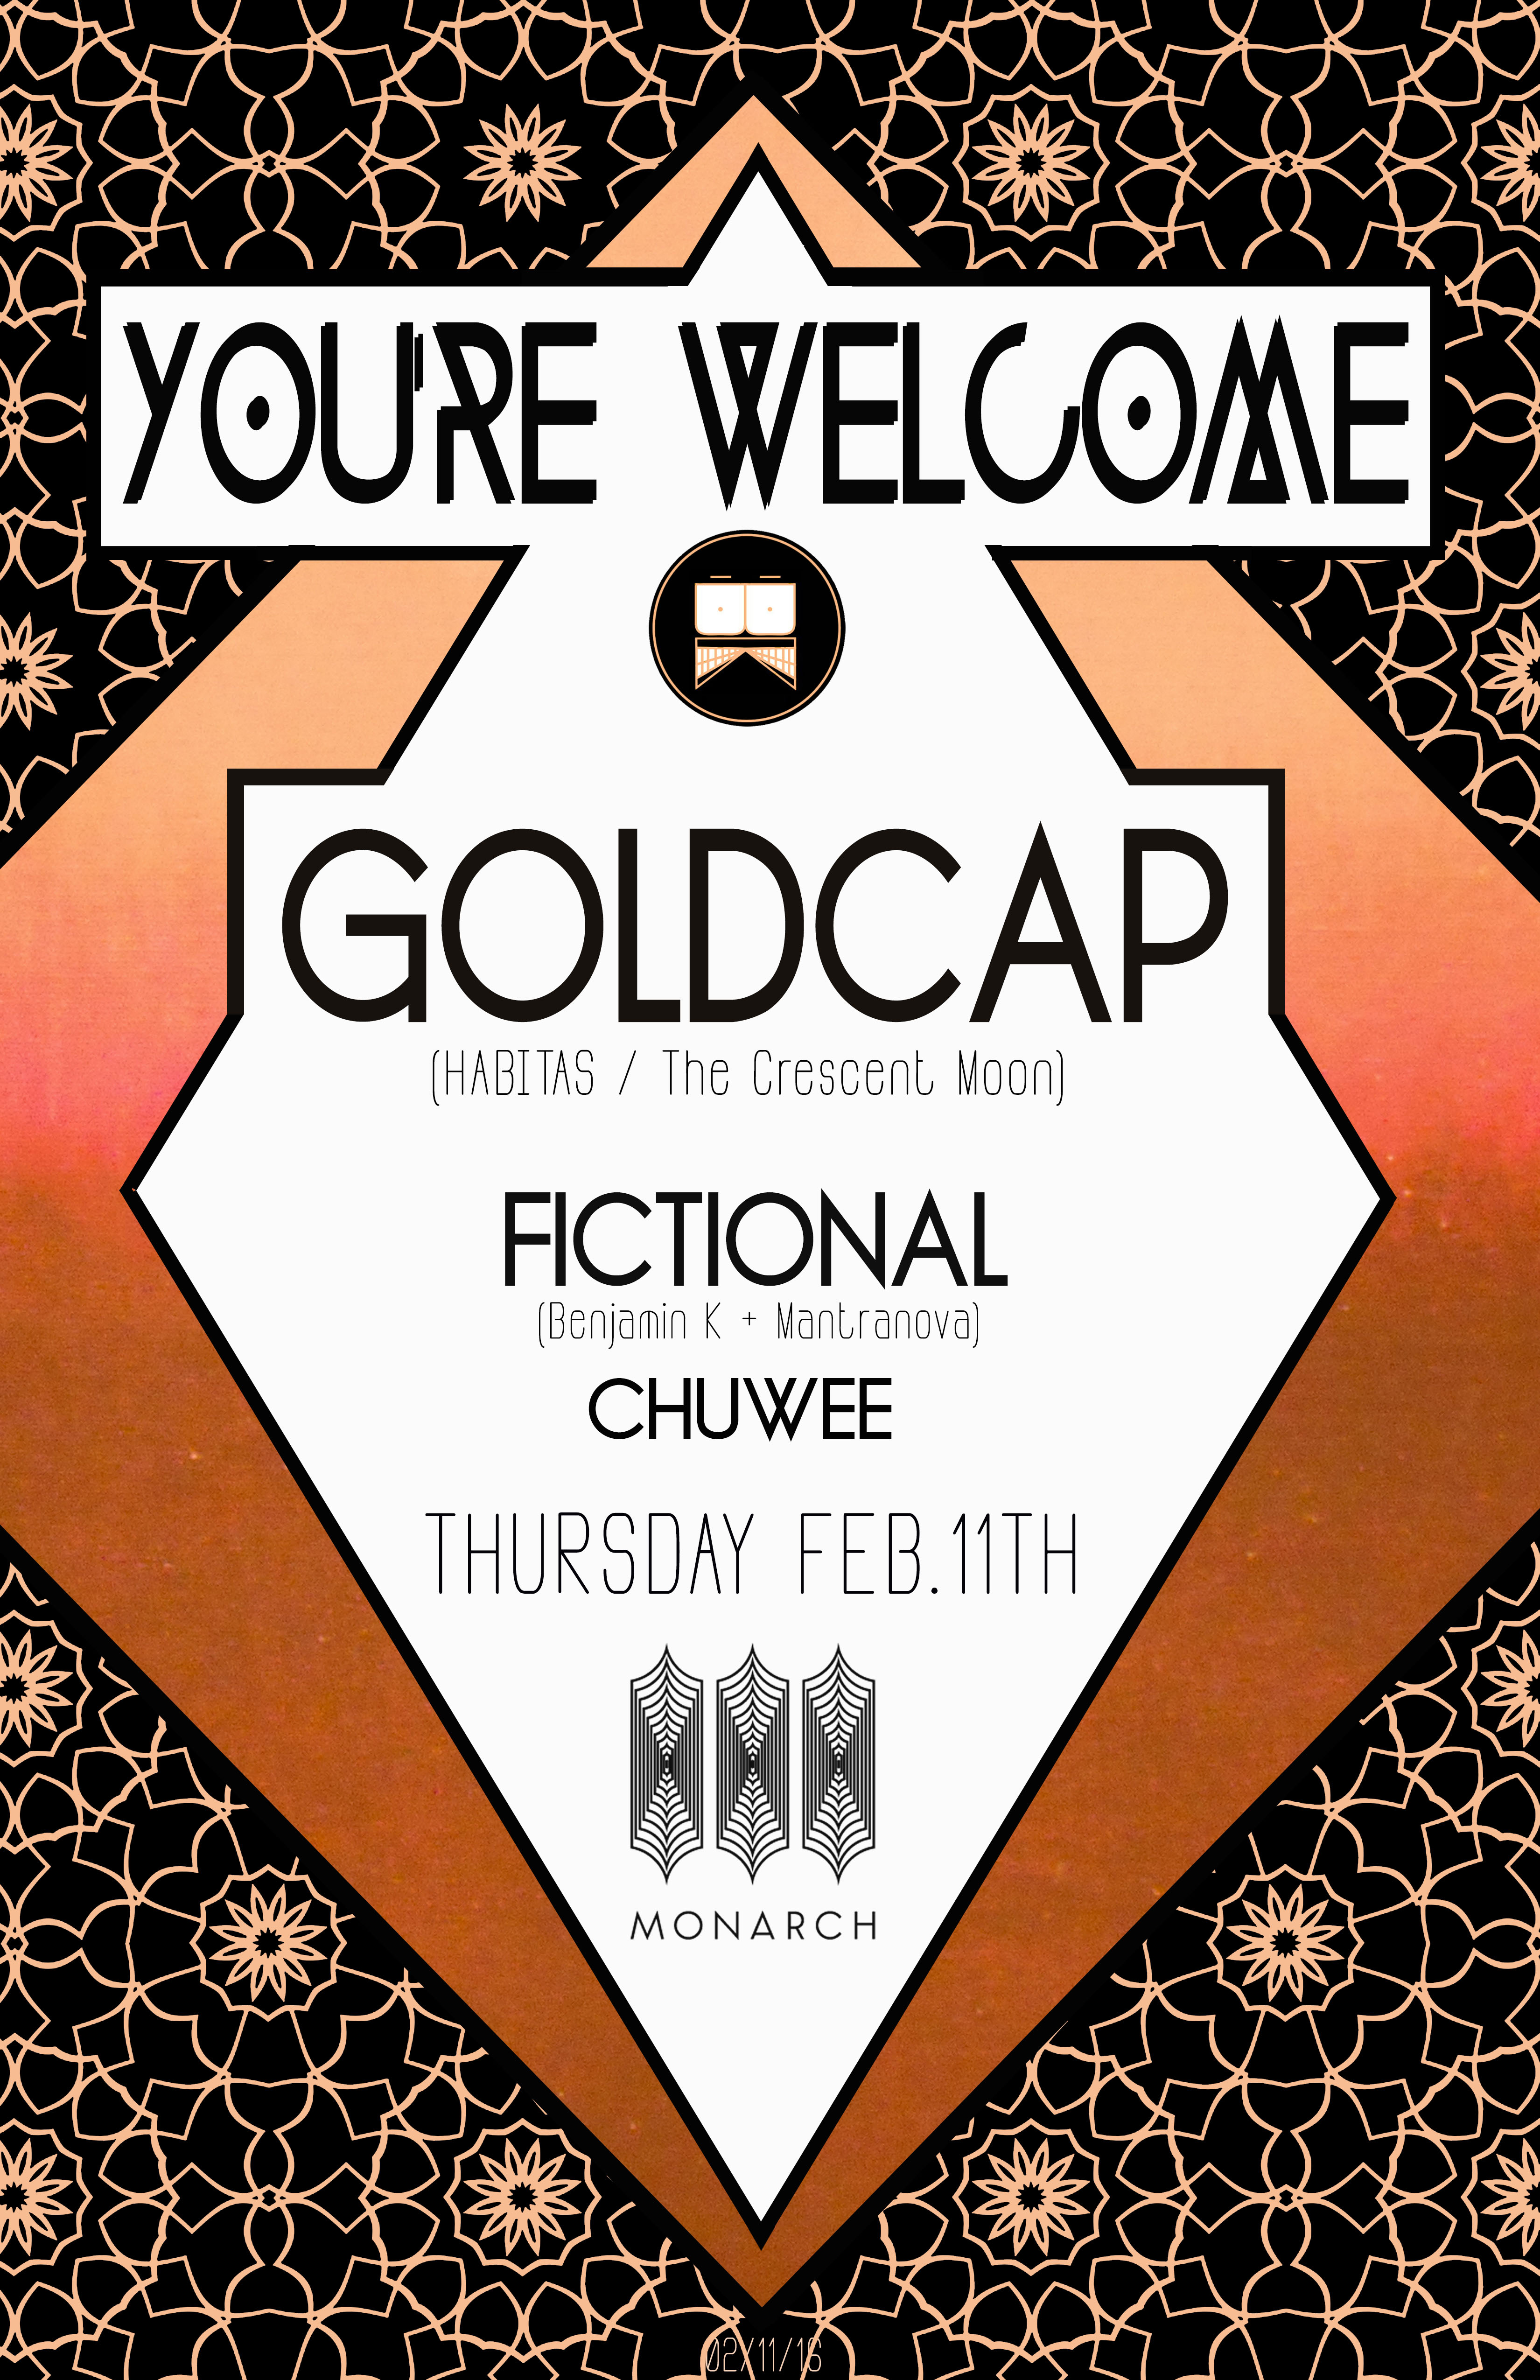 YW-Goldcap-2-11-16